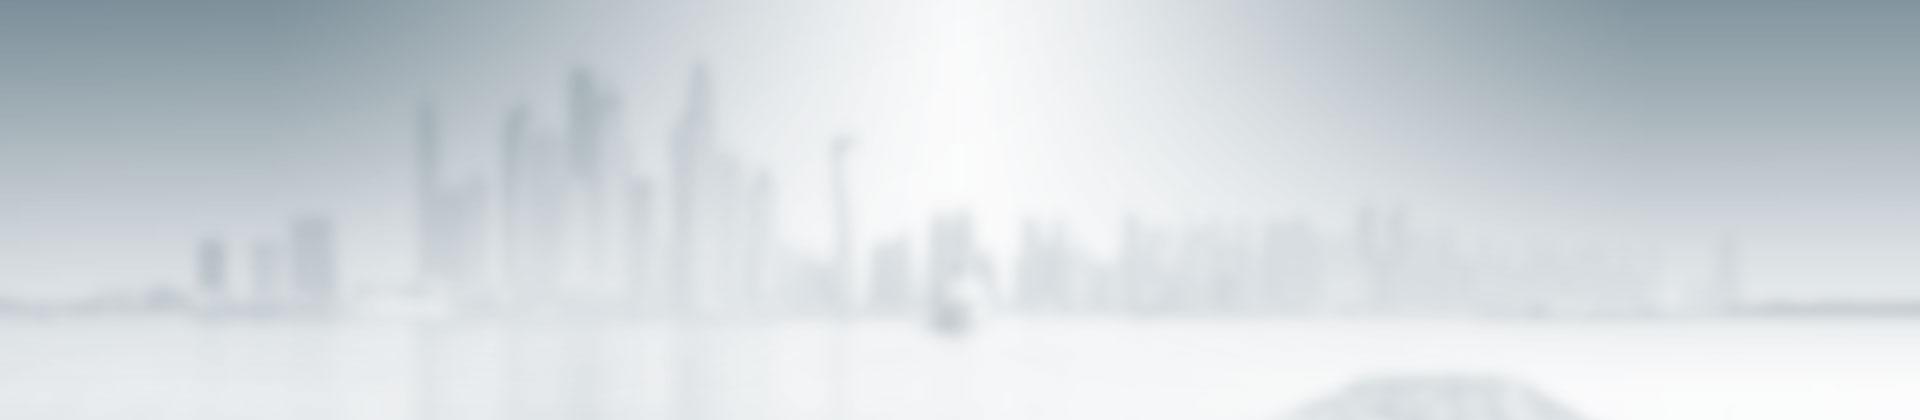 CTOsAtWork.com - Slider Backround 1